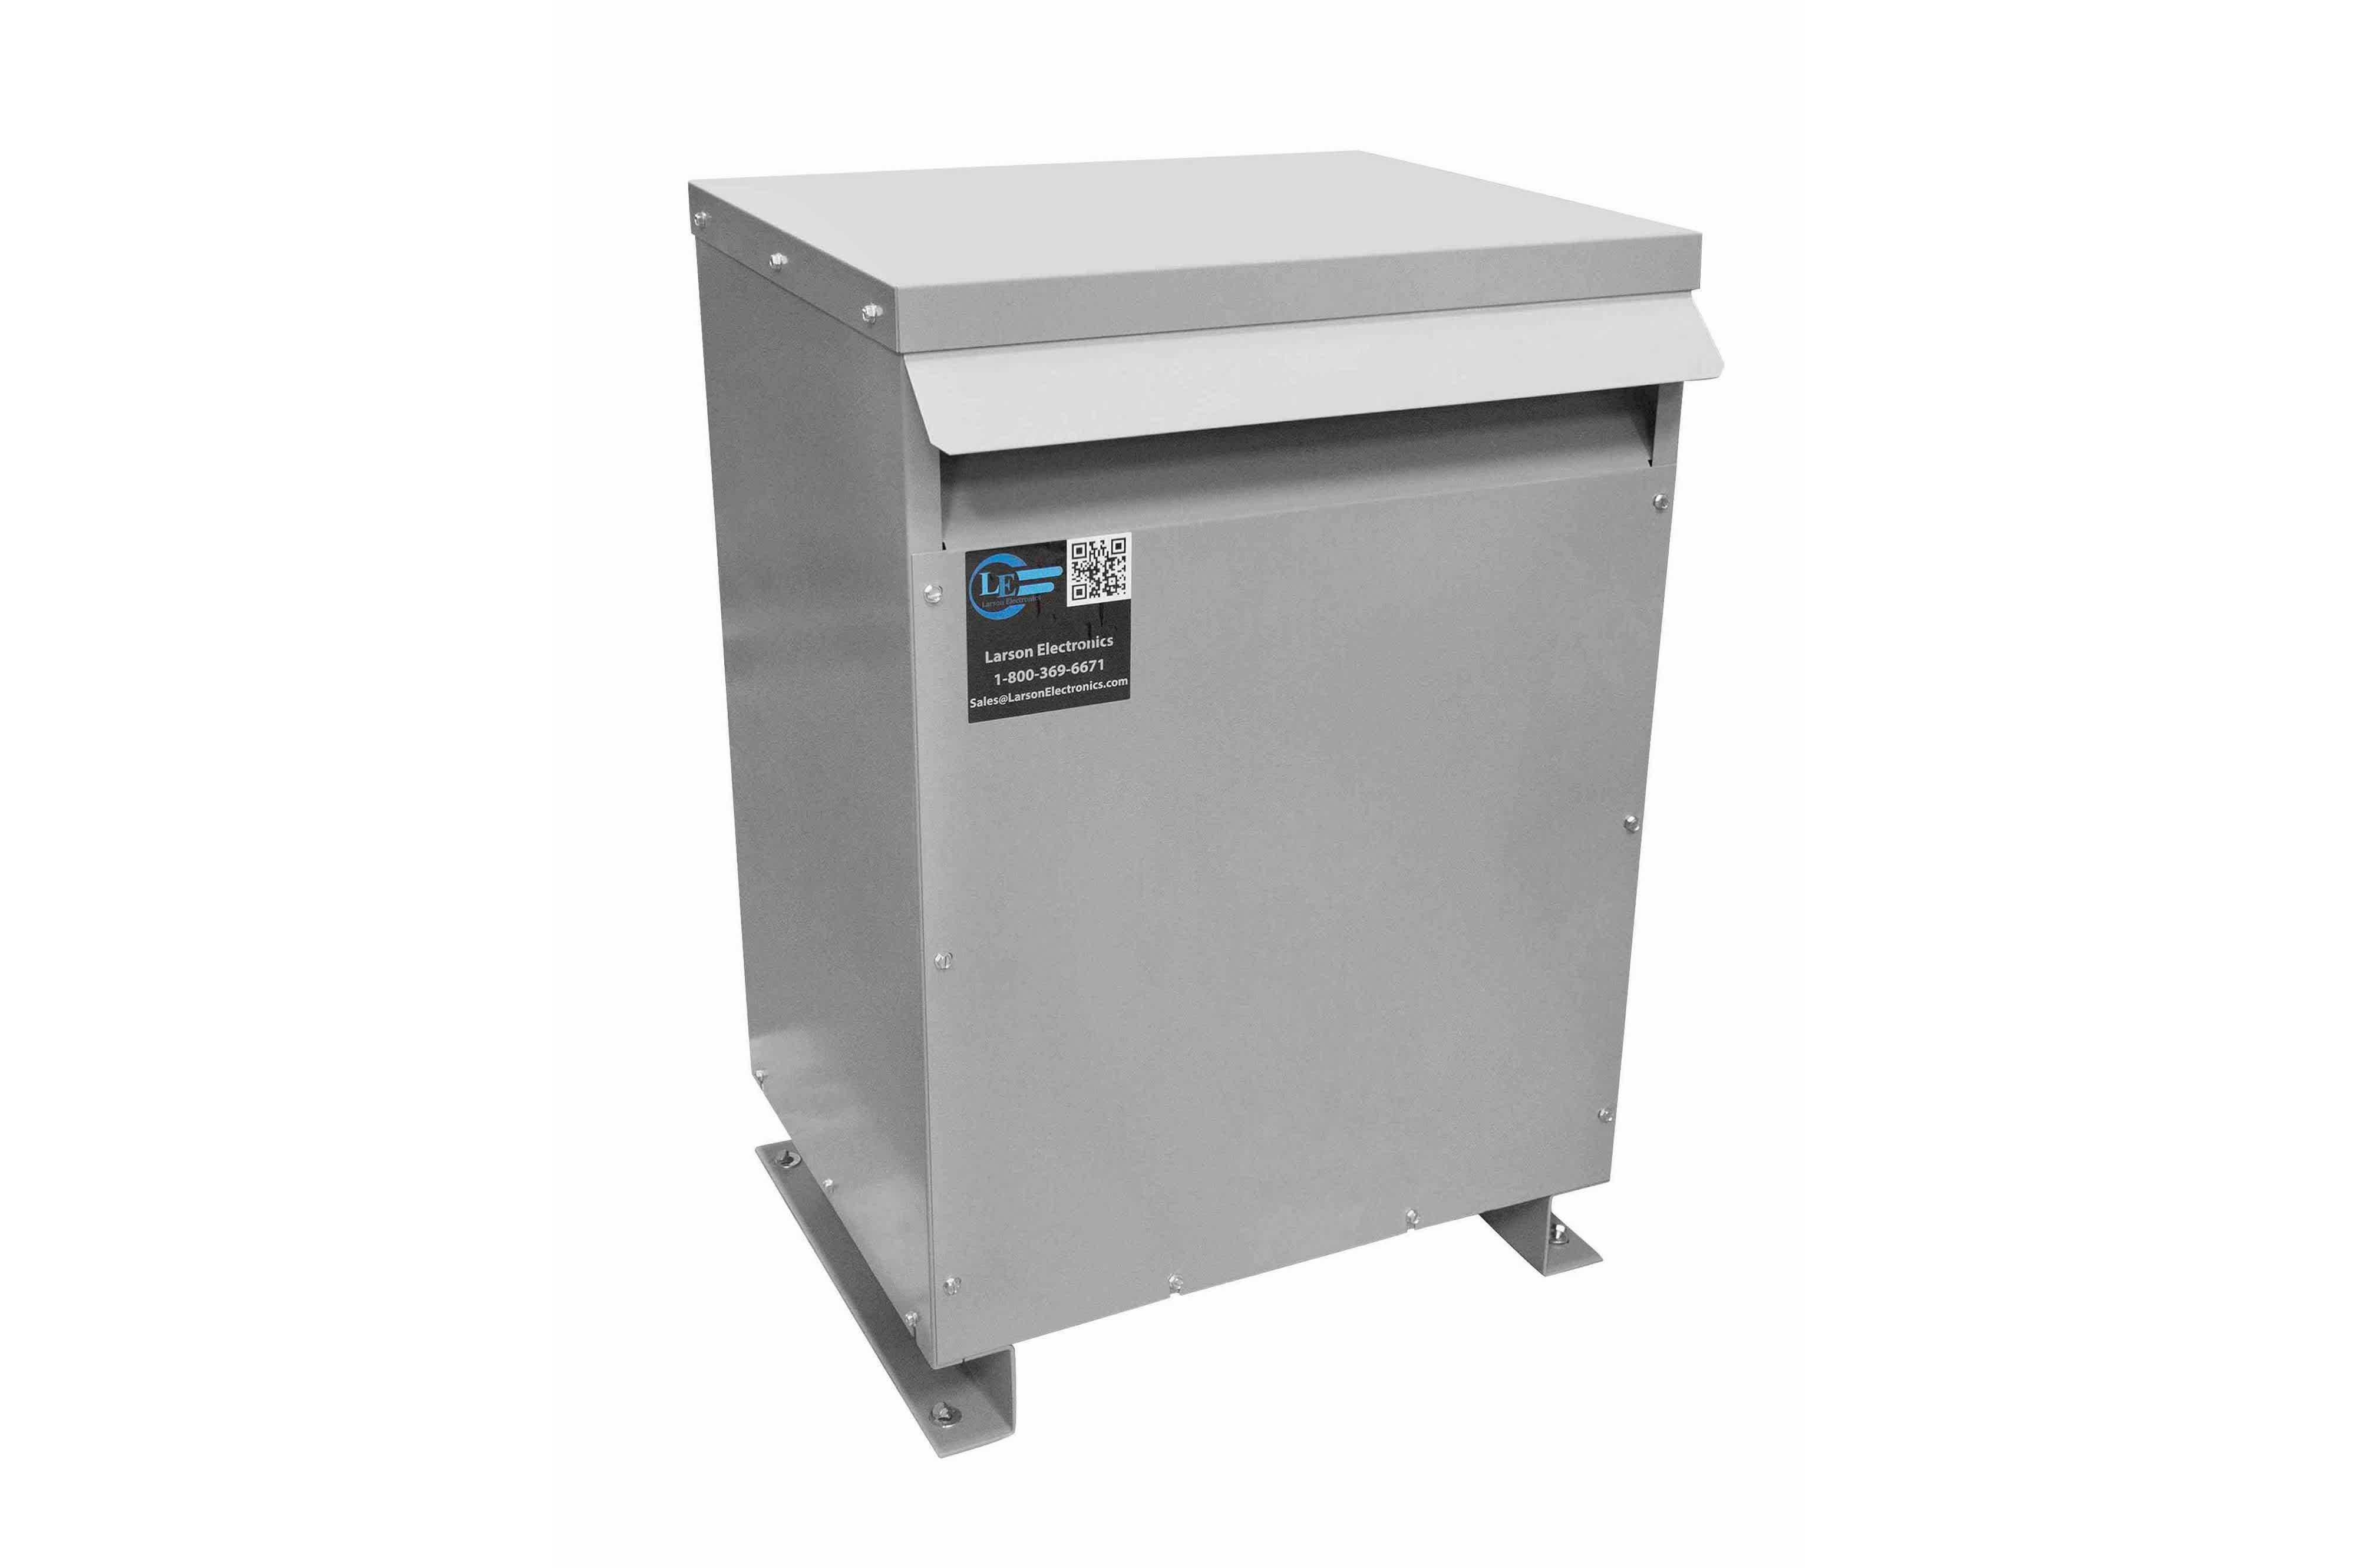 25 kVA 3PH Isolation Transformer, 575V Wye Primary, 208Y/120 Wye-N Secondary, N3R, Ventilated, 60 Hz